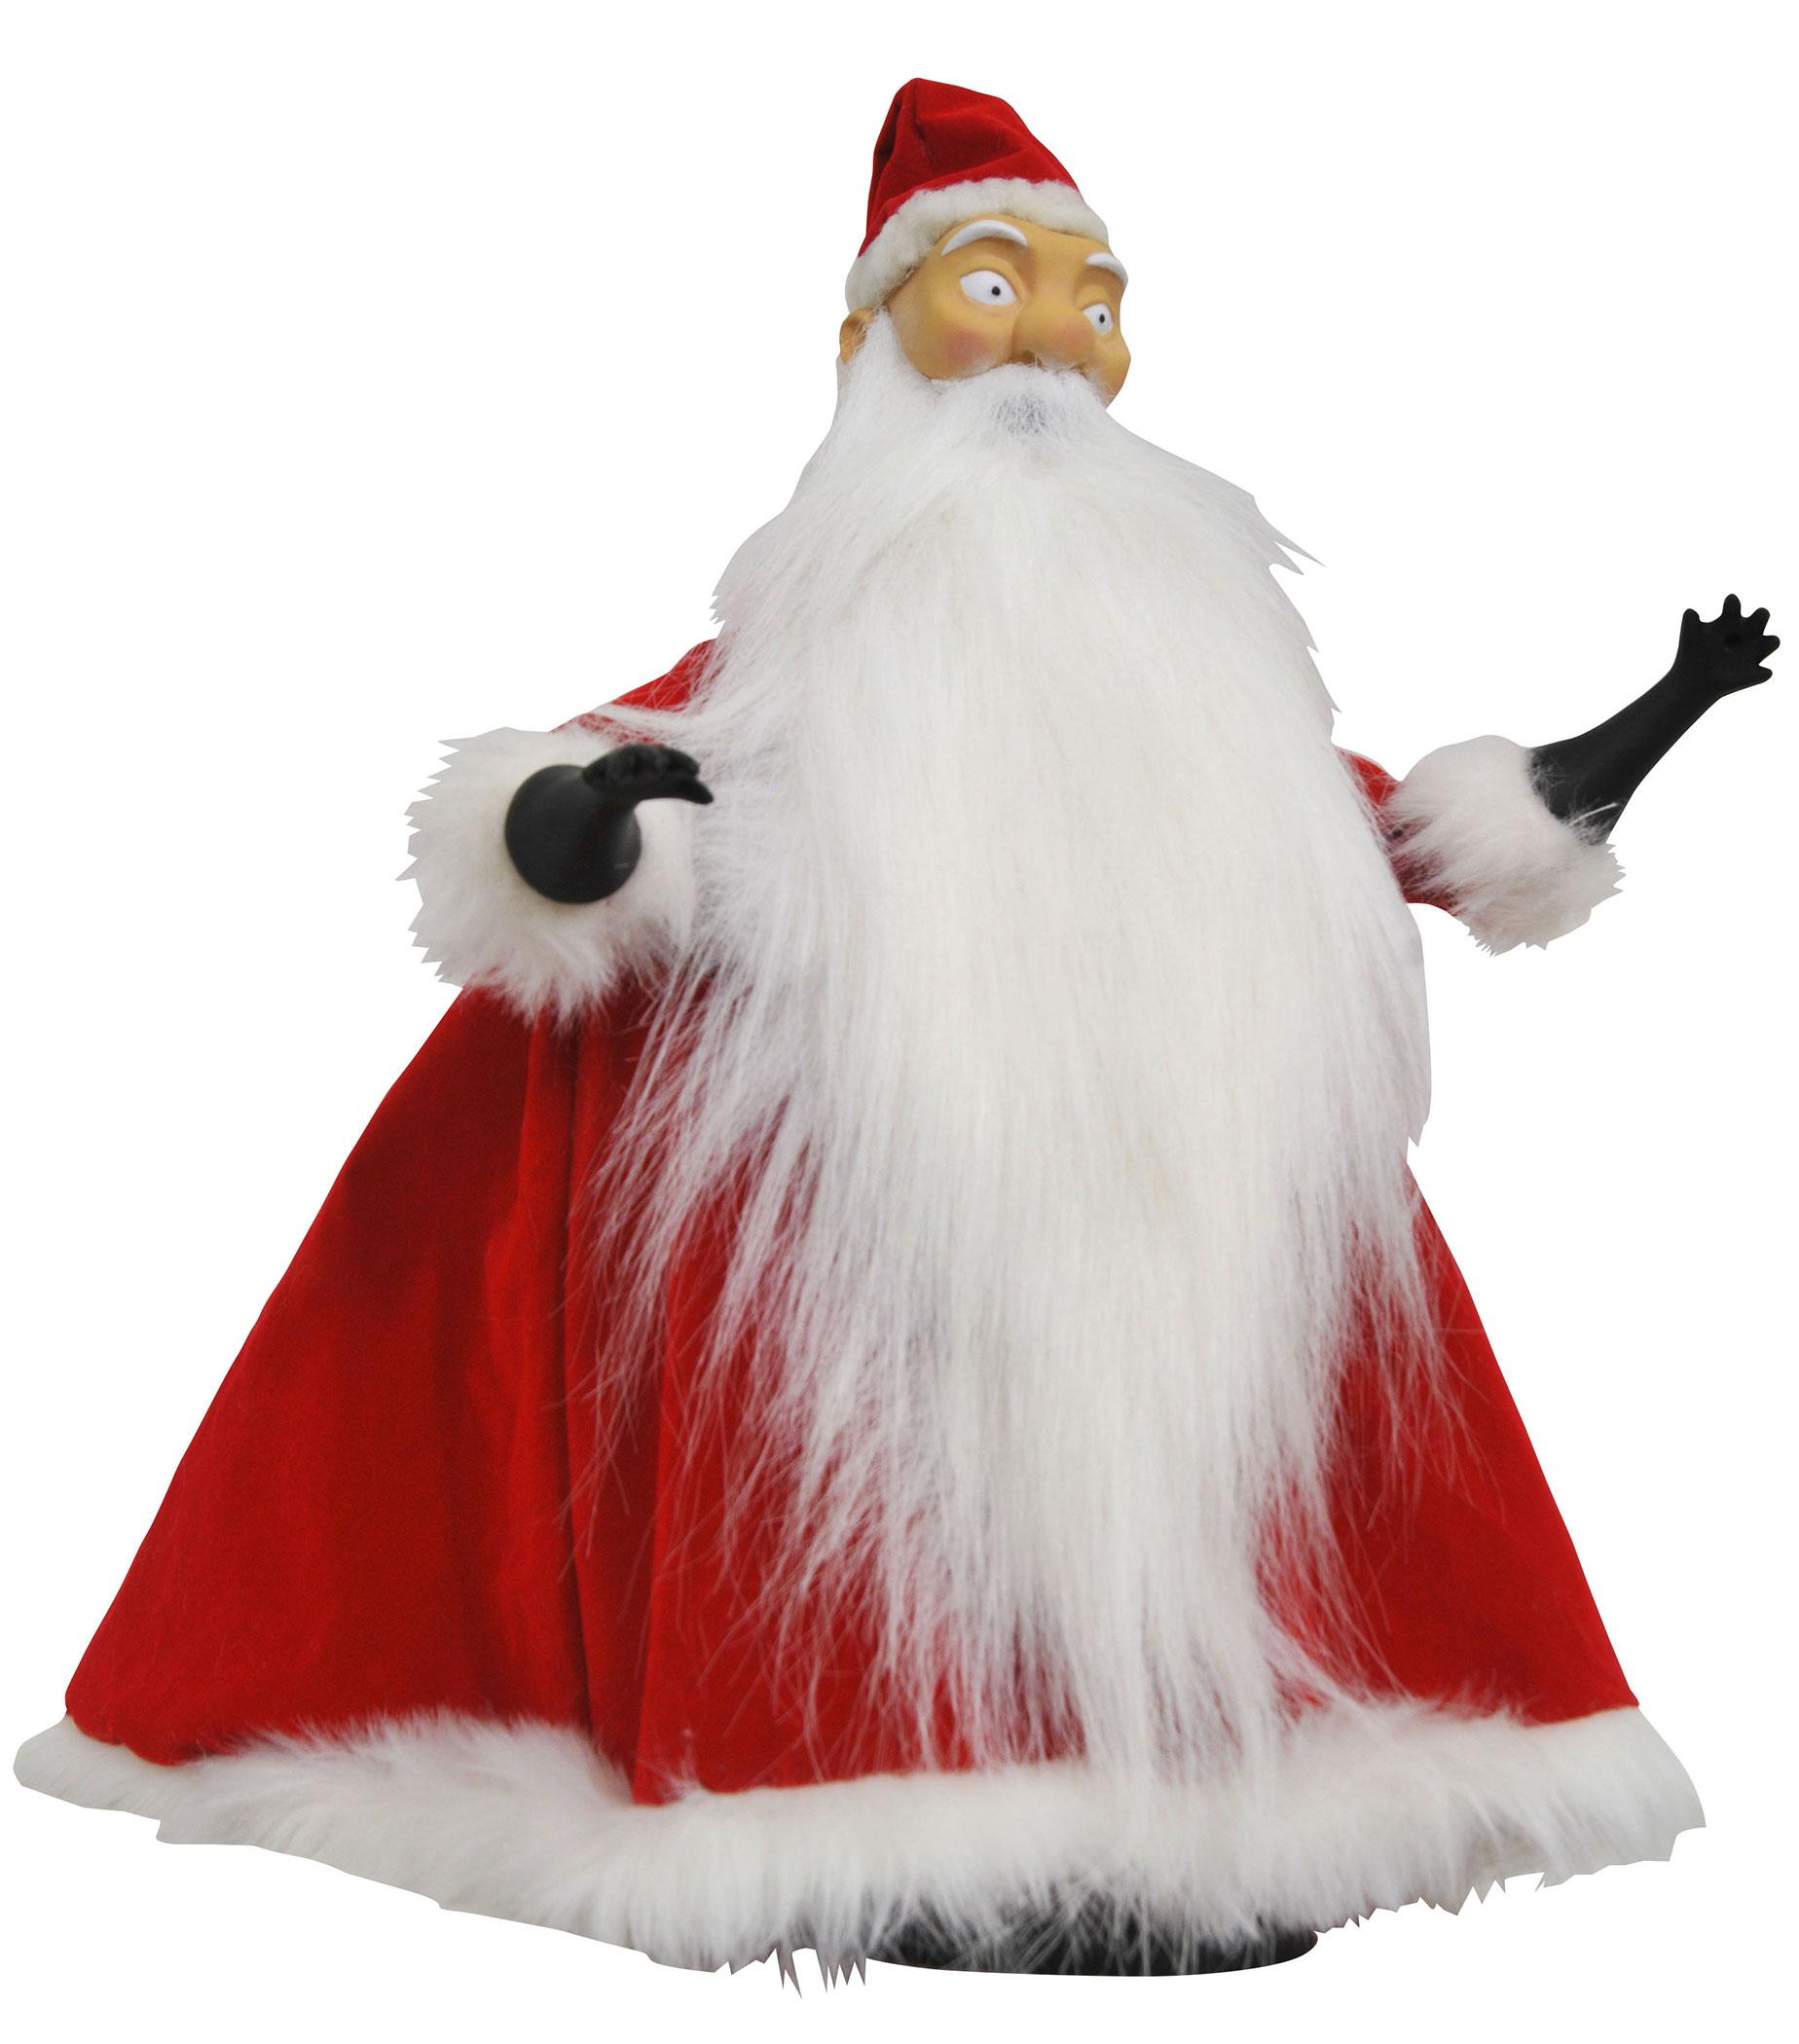 Nightmare before Christmas Doll Santa Claus 25 cm - Animegami Store